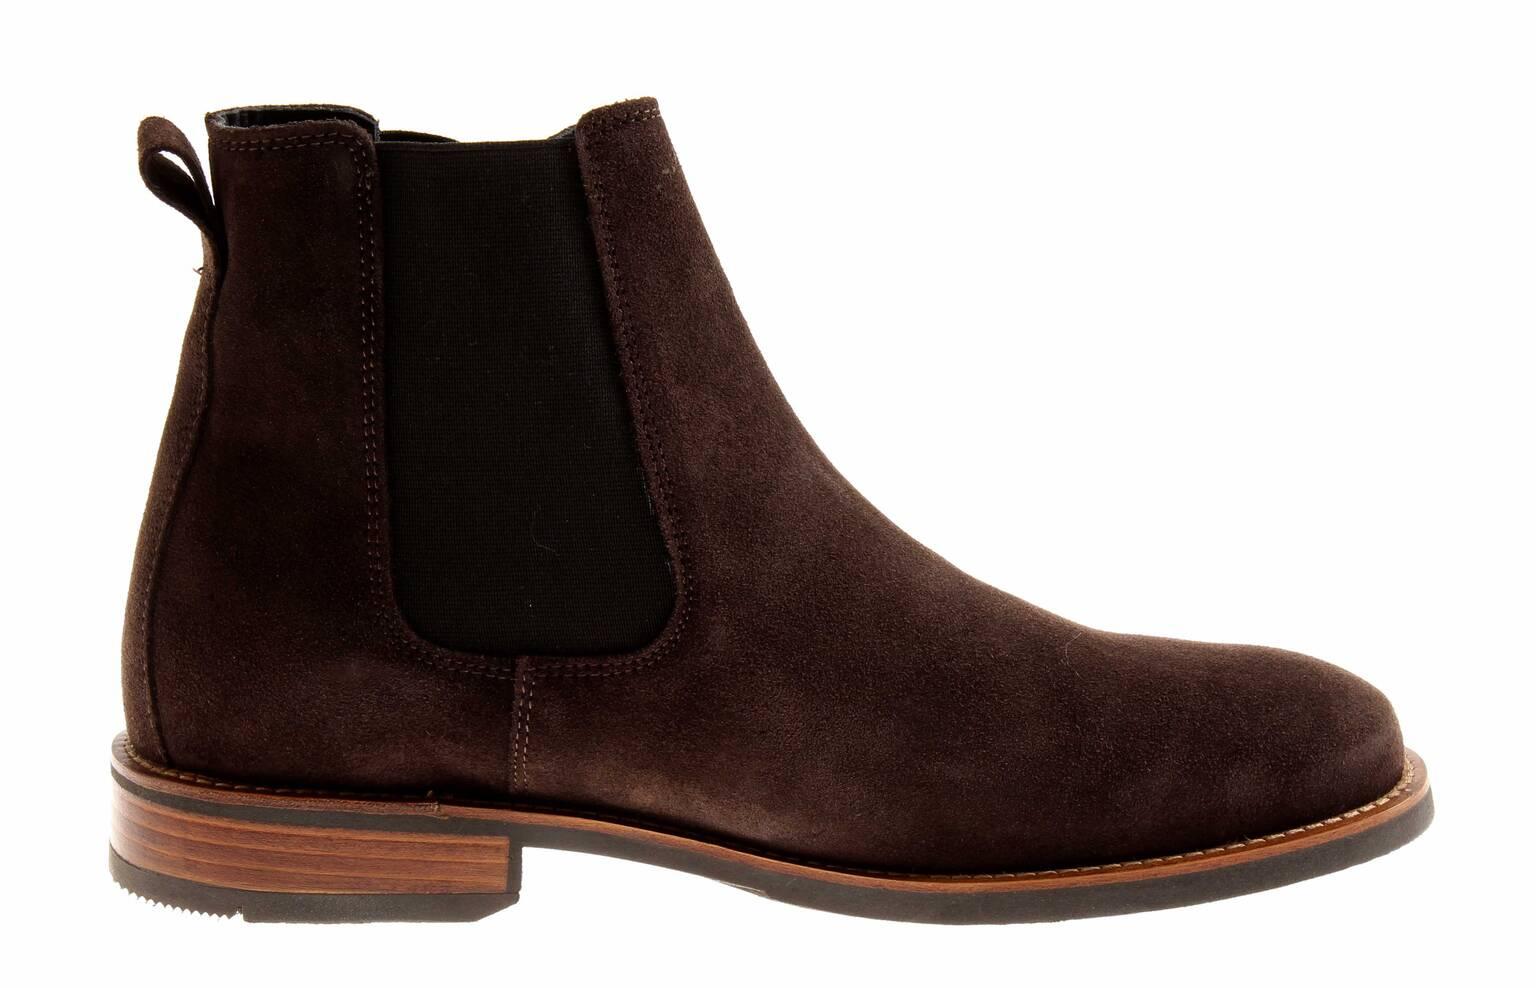 Cloud 9 by Wolky Leder Knöchelschuhe Stiefel Schuhe aus Leder Wolky Chelsea Boot bf785c